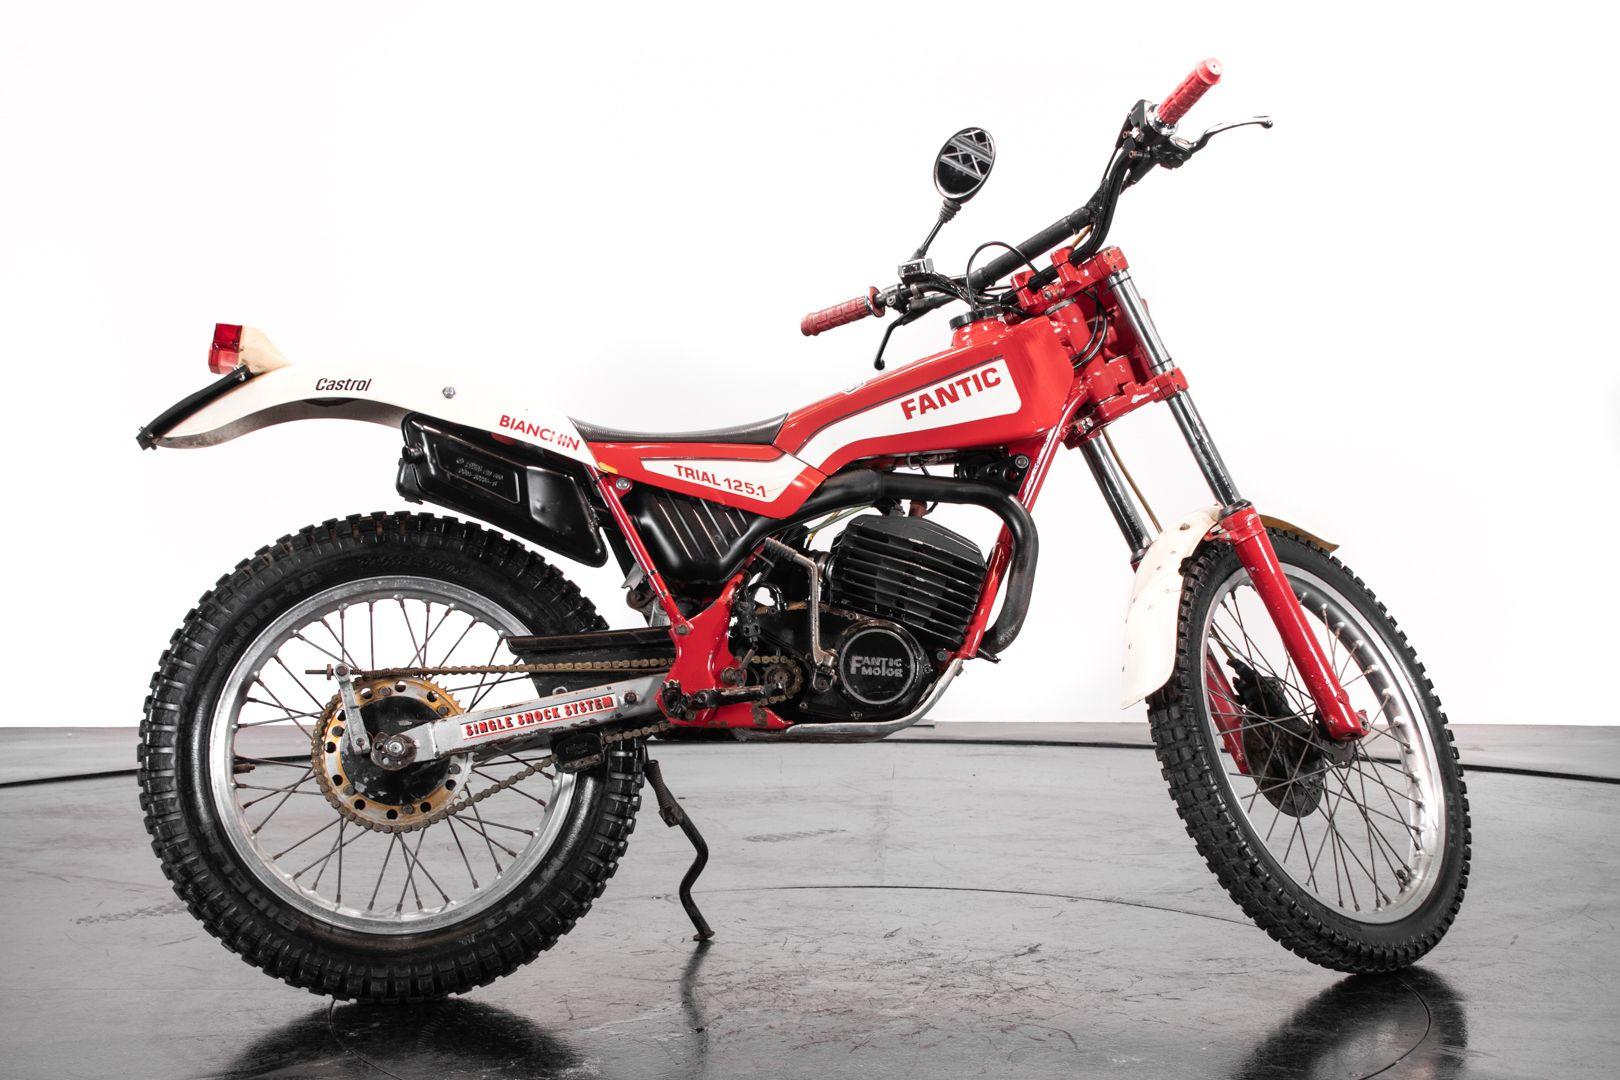 1986 Fantic Motor Trial 125 Professional 237 69030